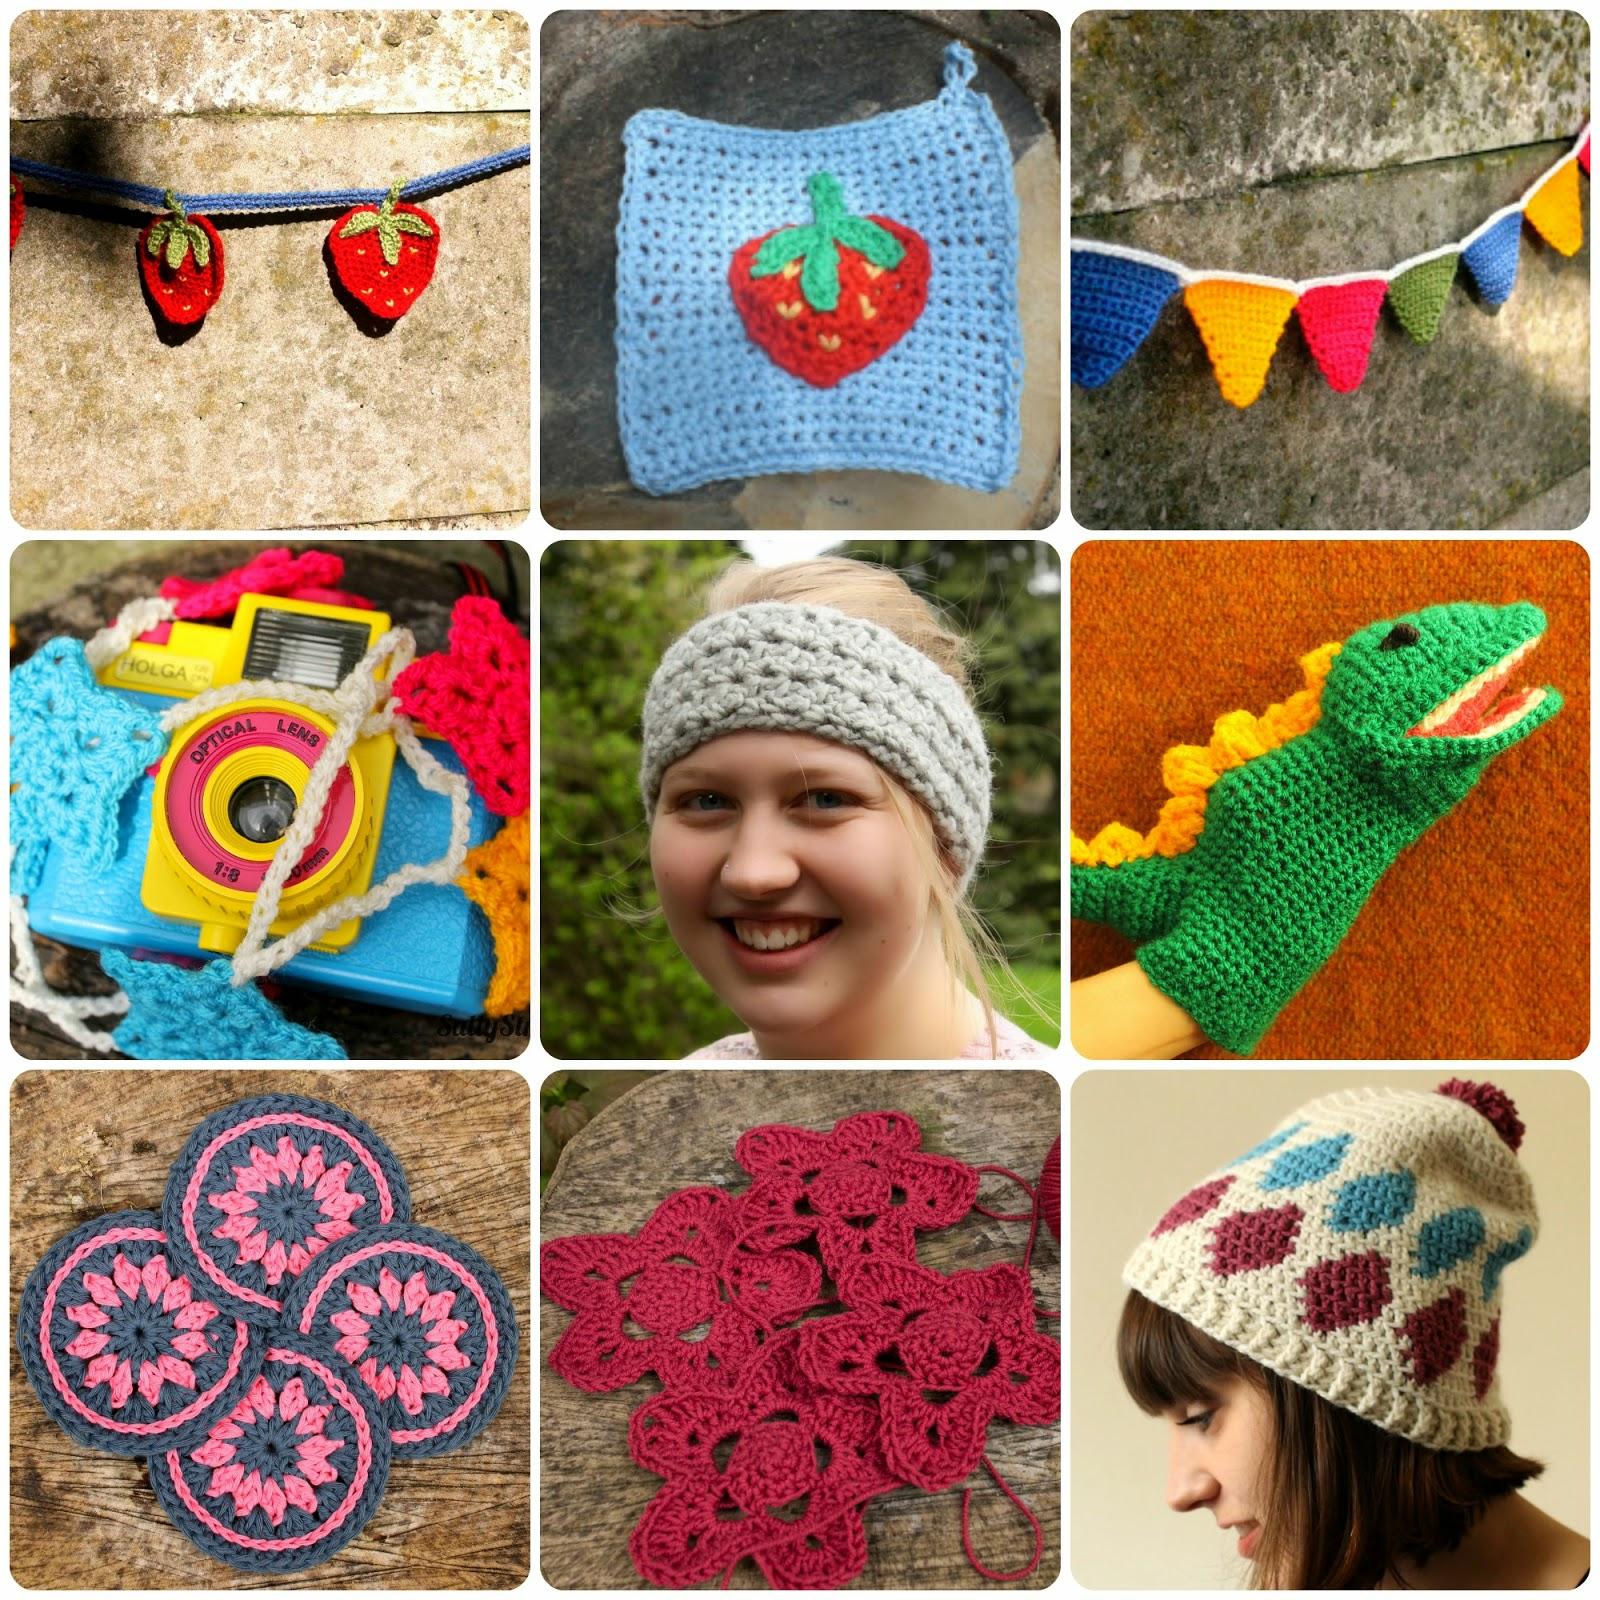 Crochet designs by SallyStrawberry